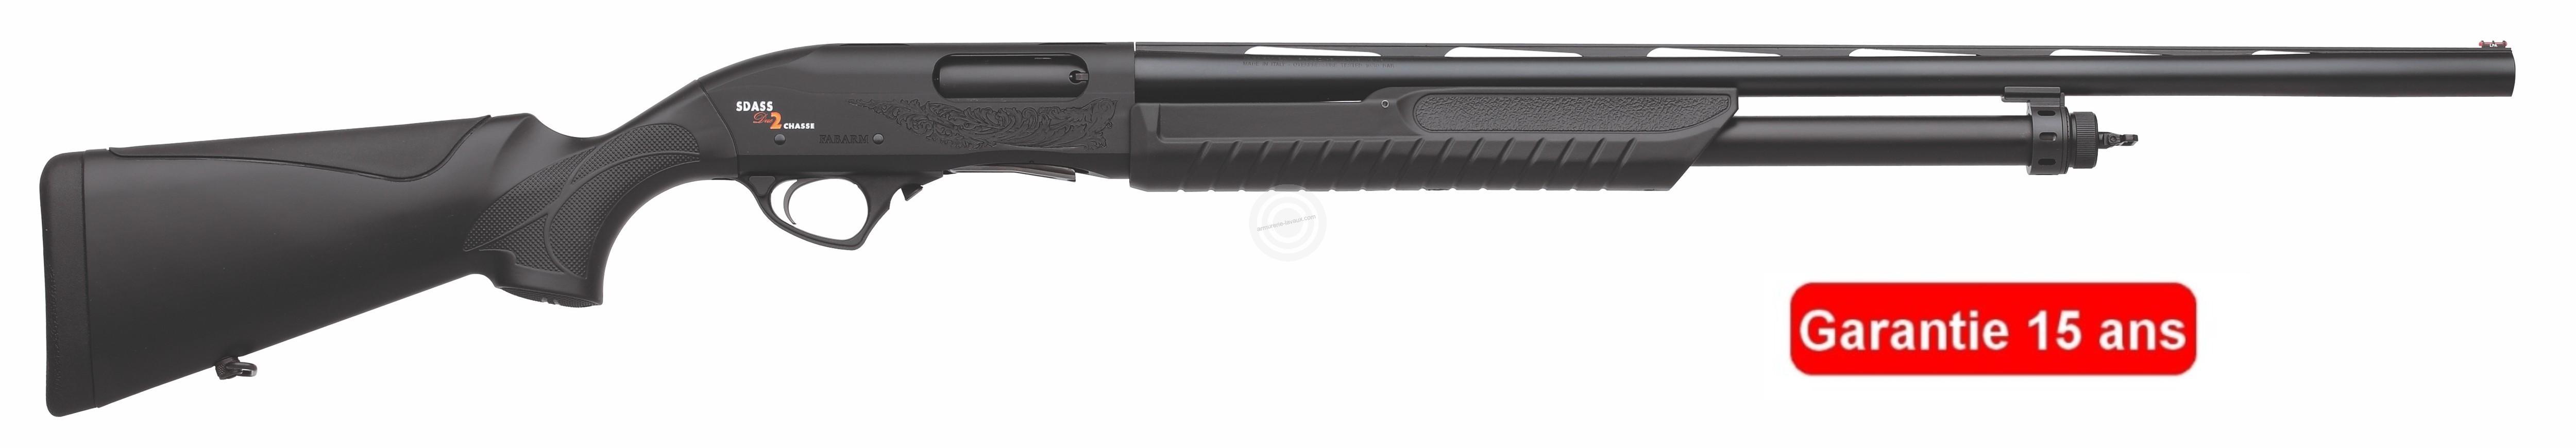 Fusil à pompe FABARM SDASS Compo Chasse cal.12/76 (canon de 76cm)